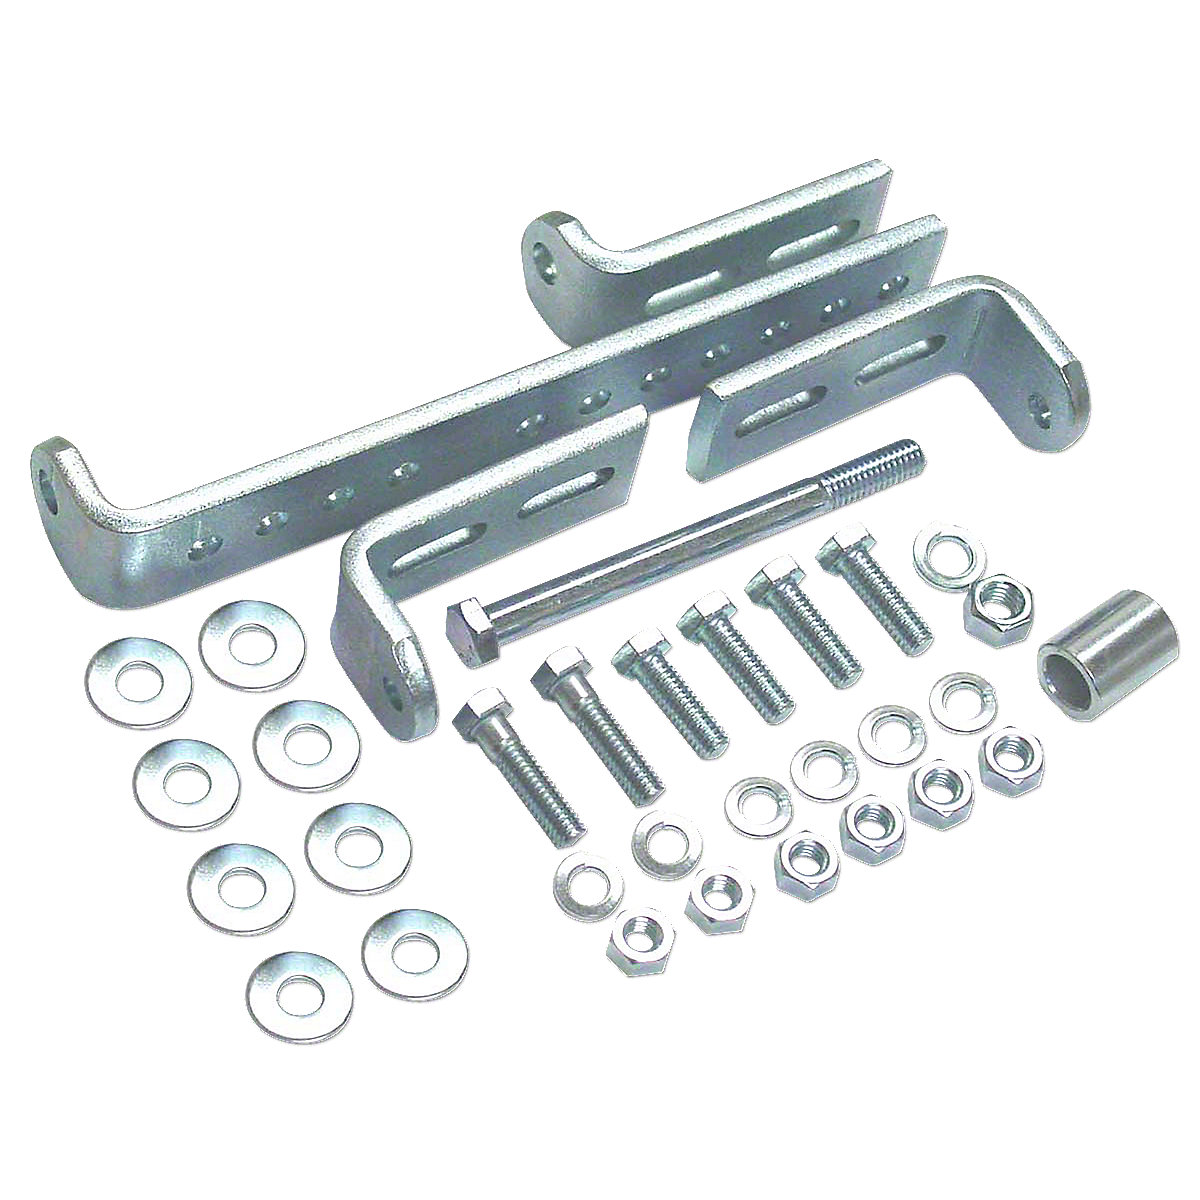 ABC404Universal Alternator Mounting Kit